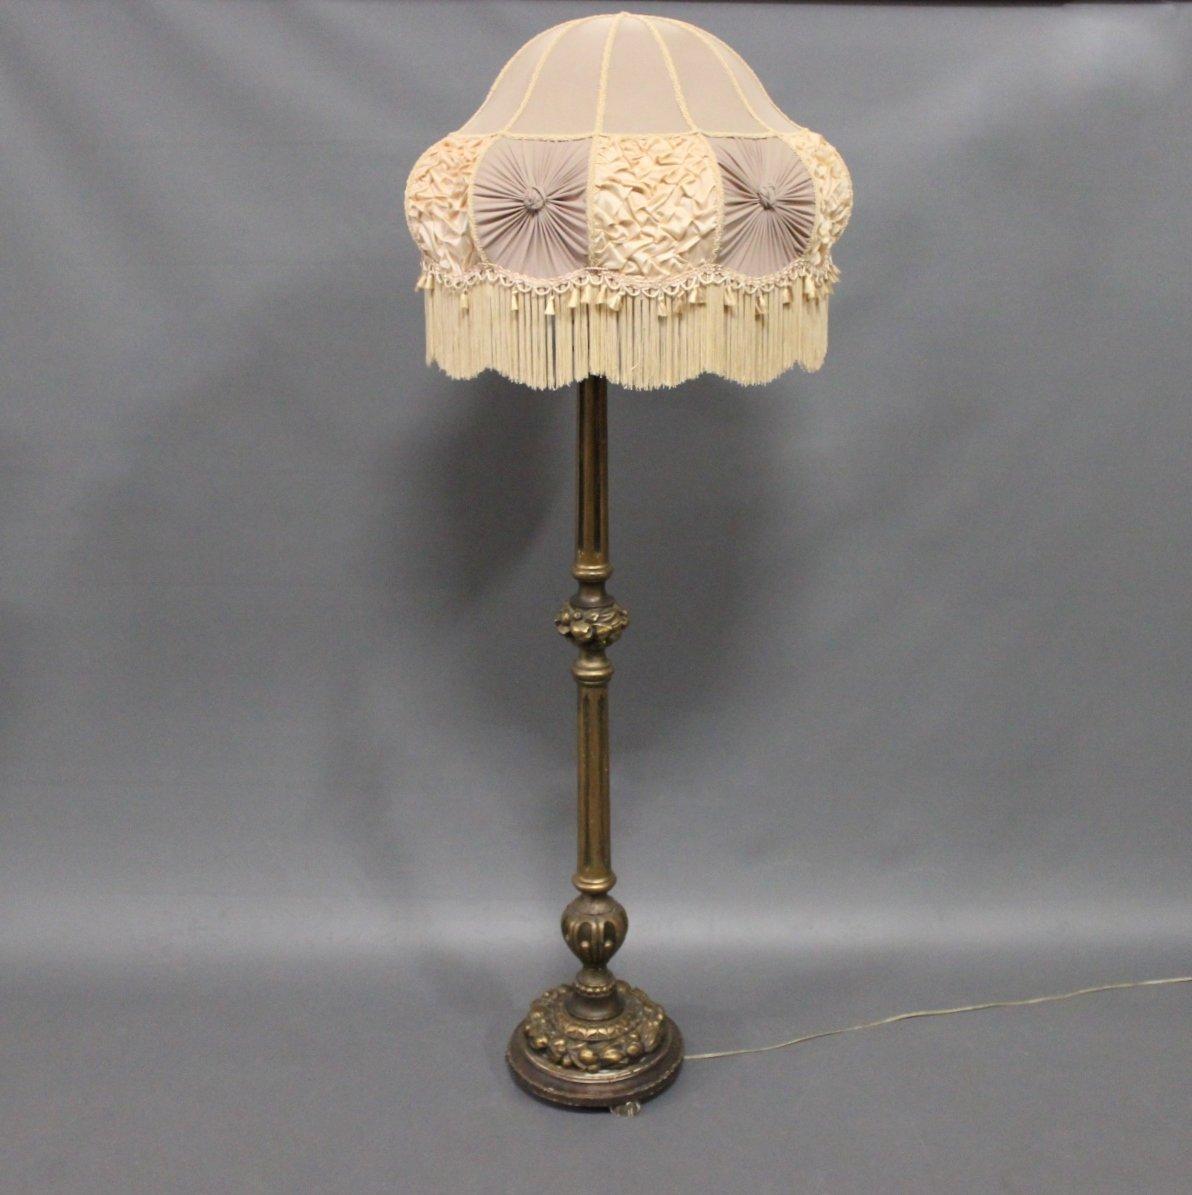 Antike Vergoldete Stehlampe aus Holz, 1920er